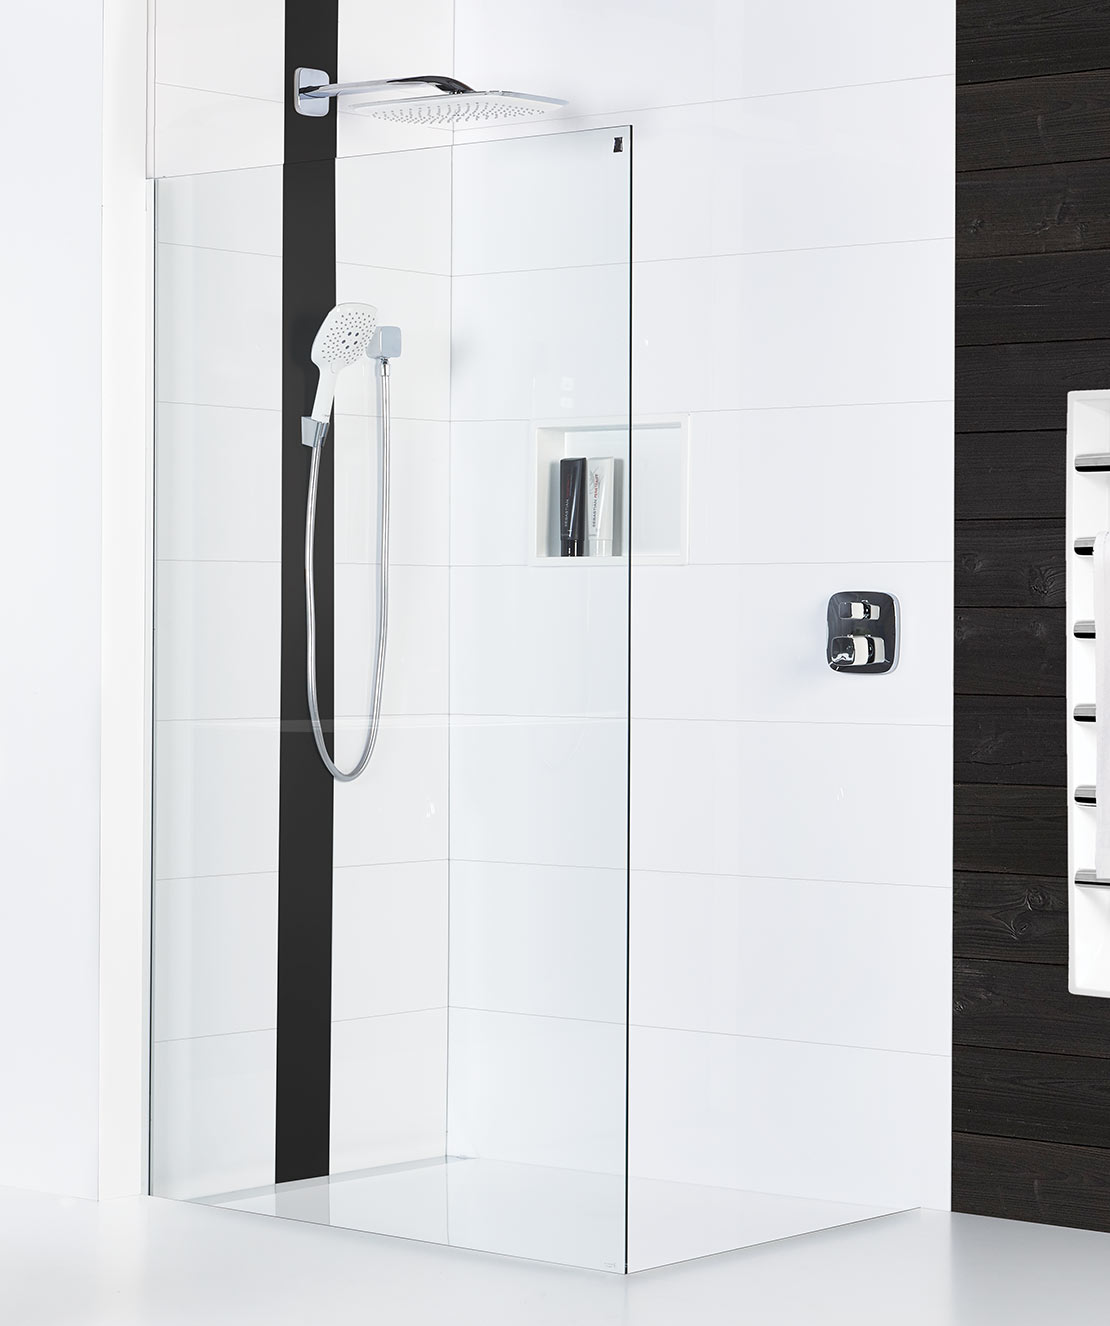 Ellure Tile Look Shower Walls Atlantis Bathroom Style